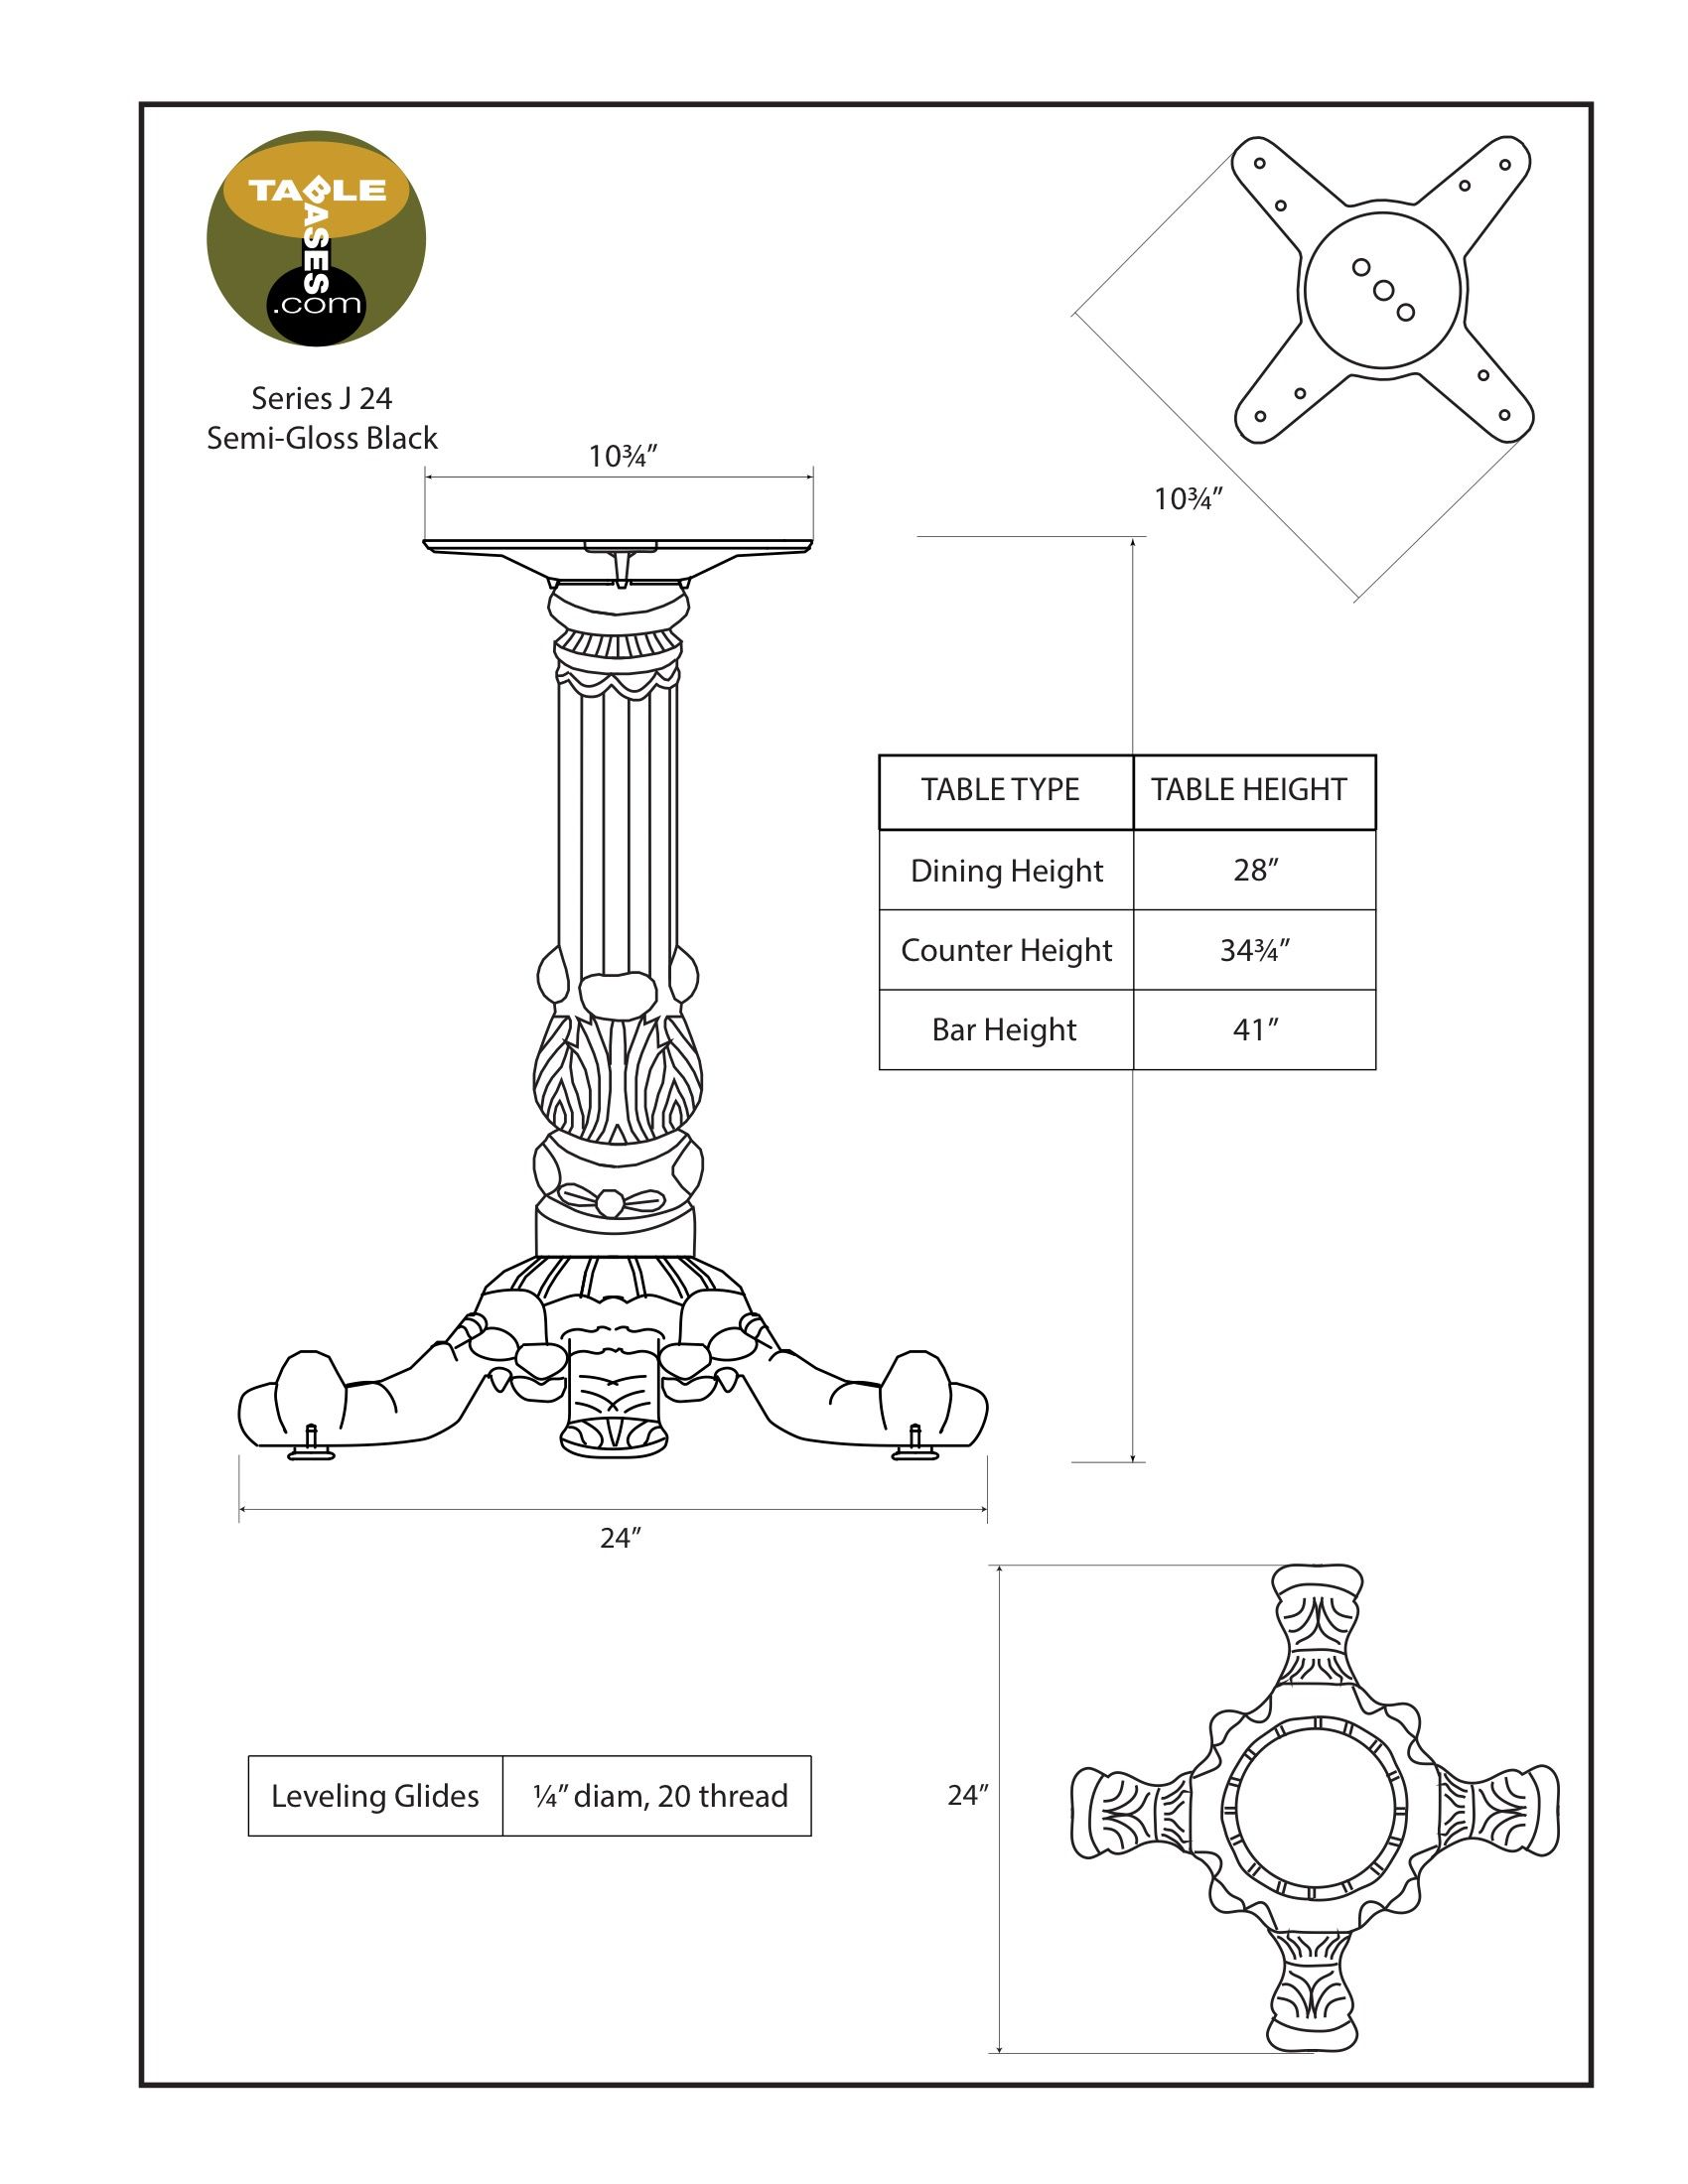 J24 Semi-Gloss Black Table Base - Specifications